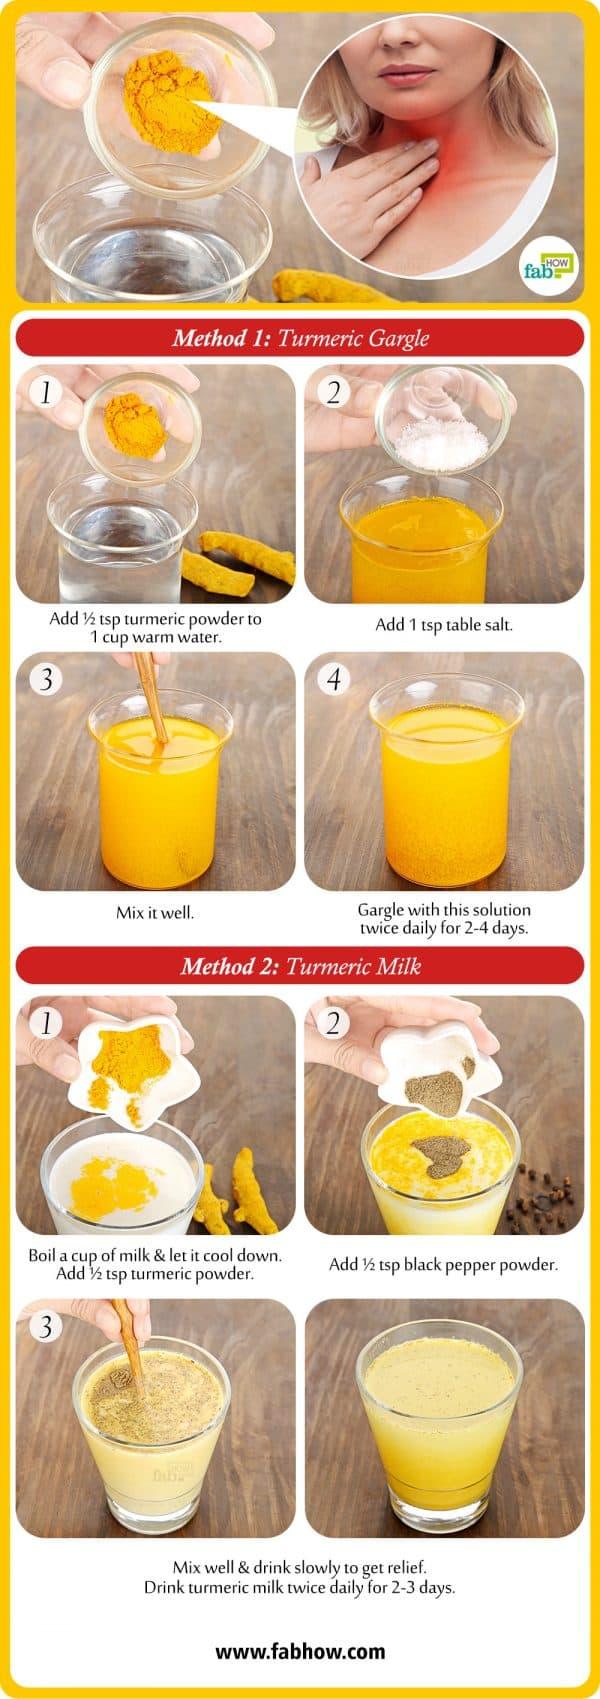 How to Use Turmeric for Sore Throat Summary